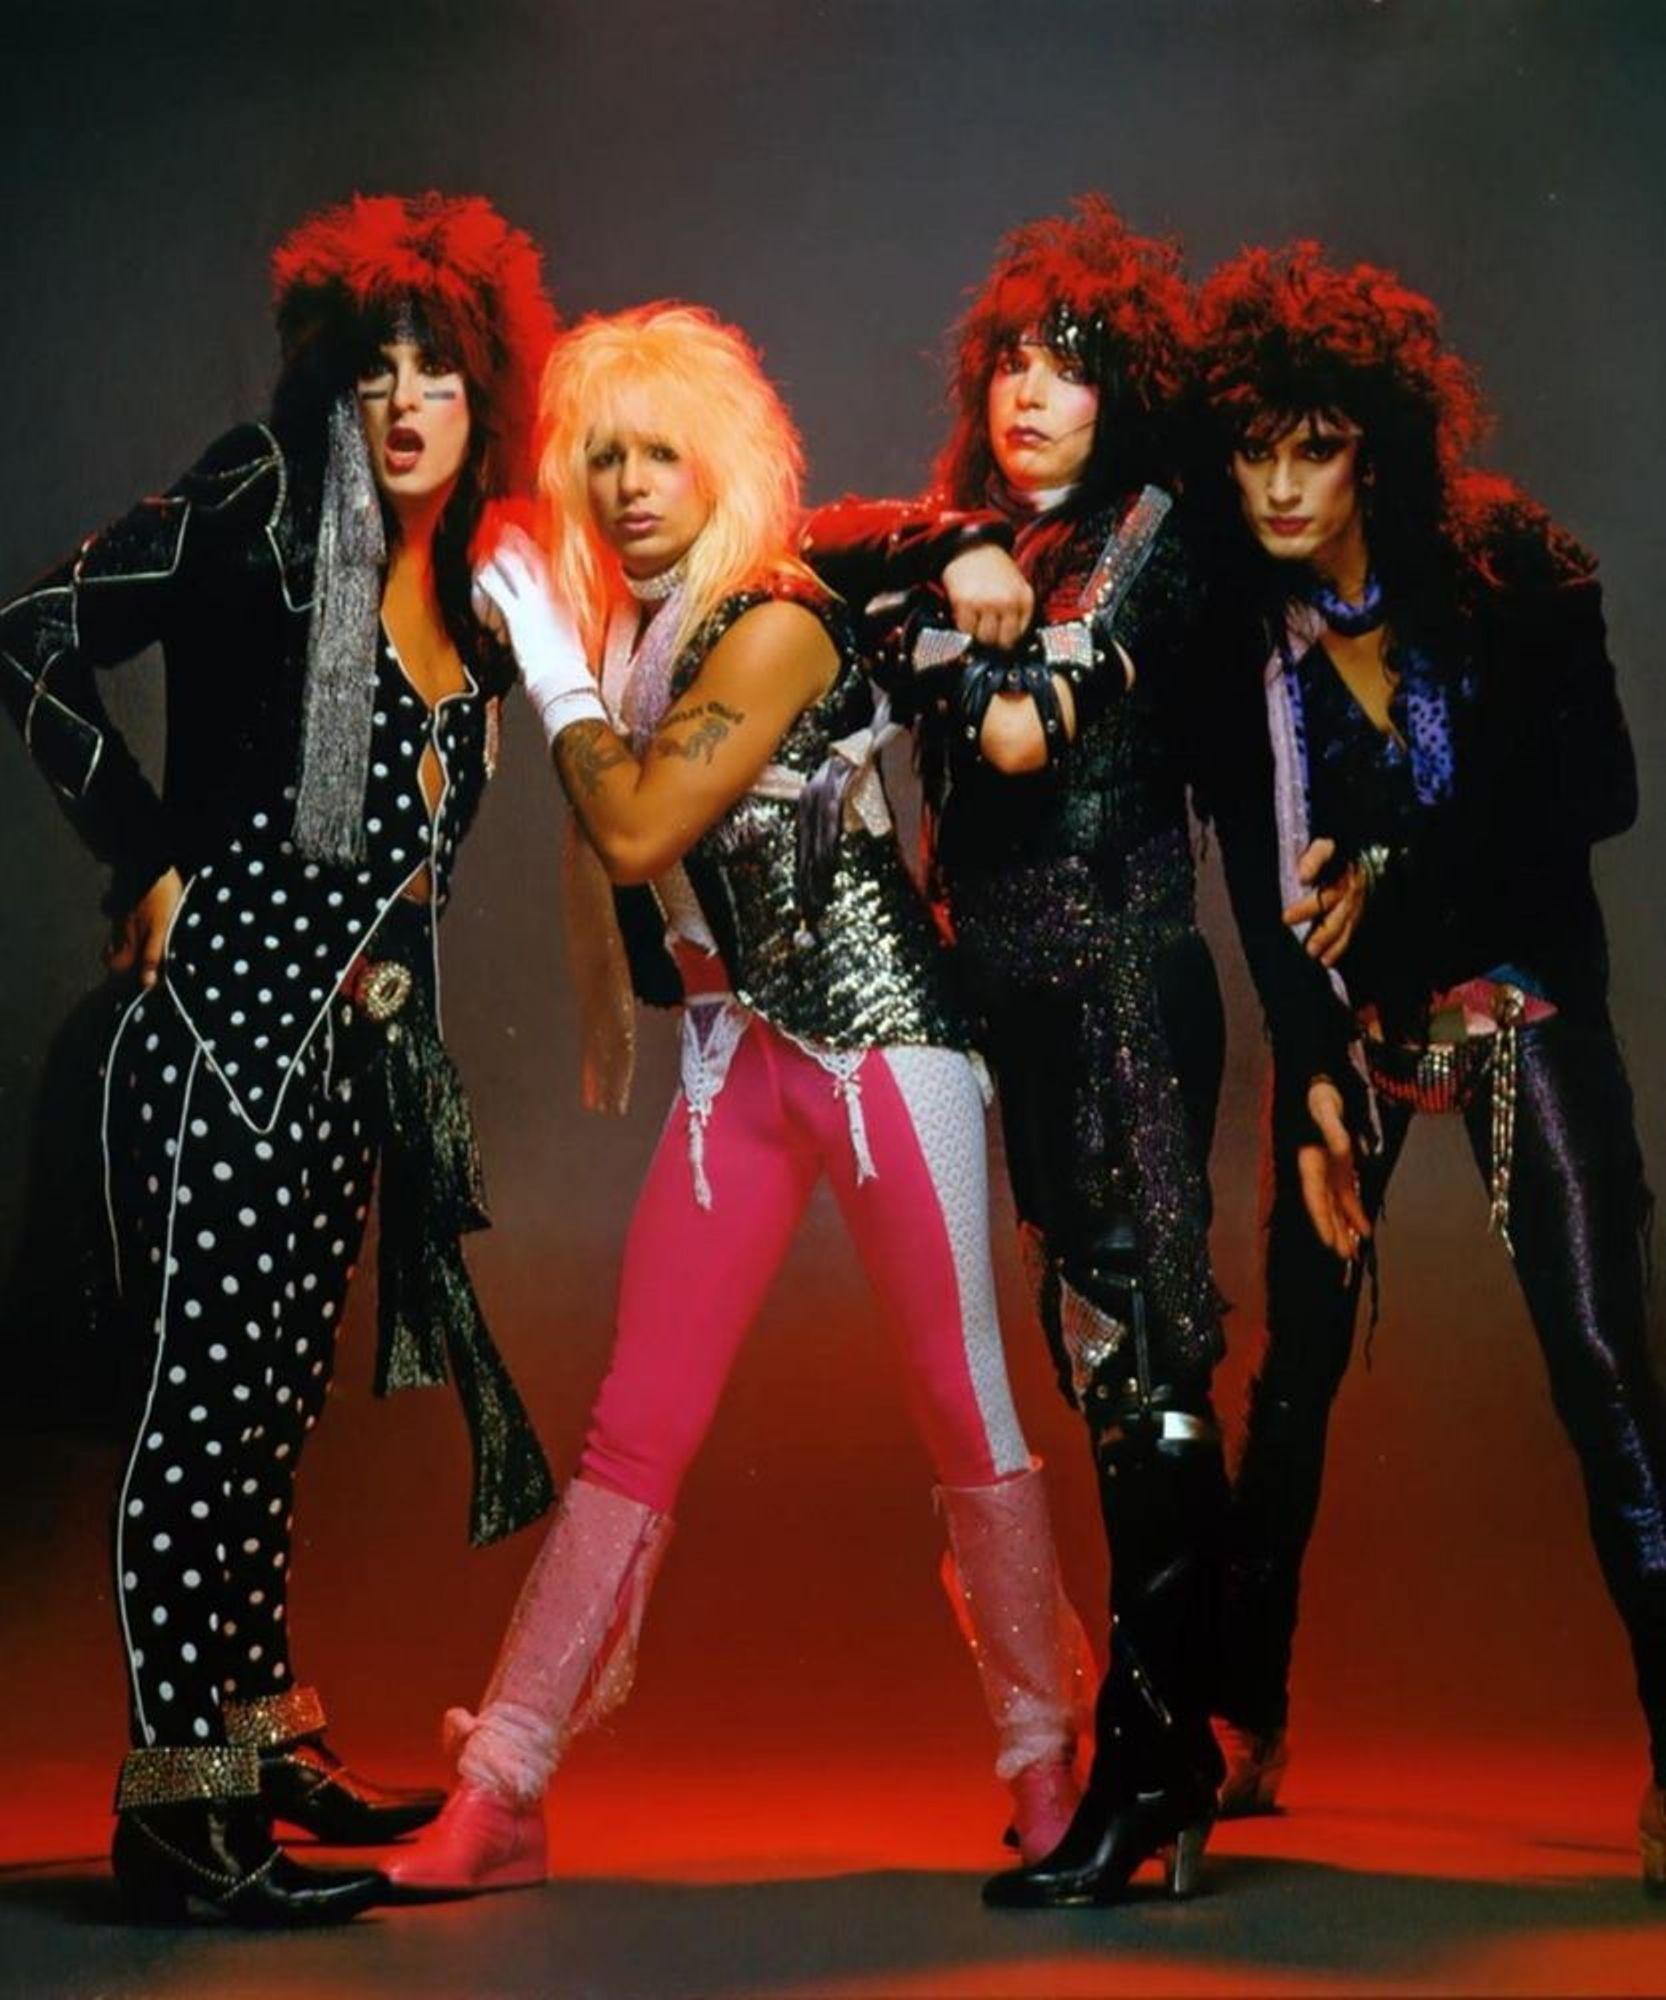 Mötley Crüe 1985 Motley crue, Motley, The wedding singer